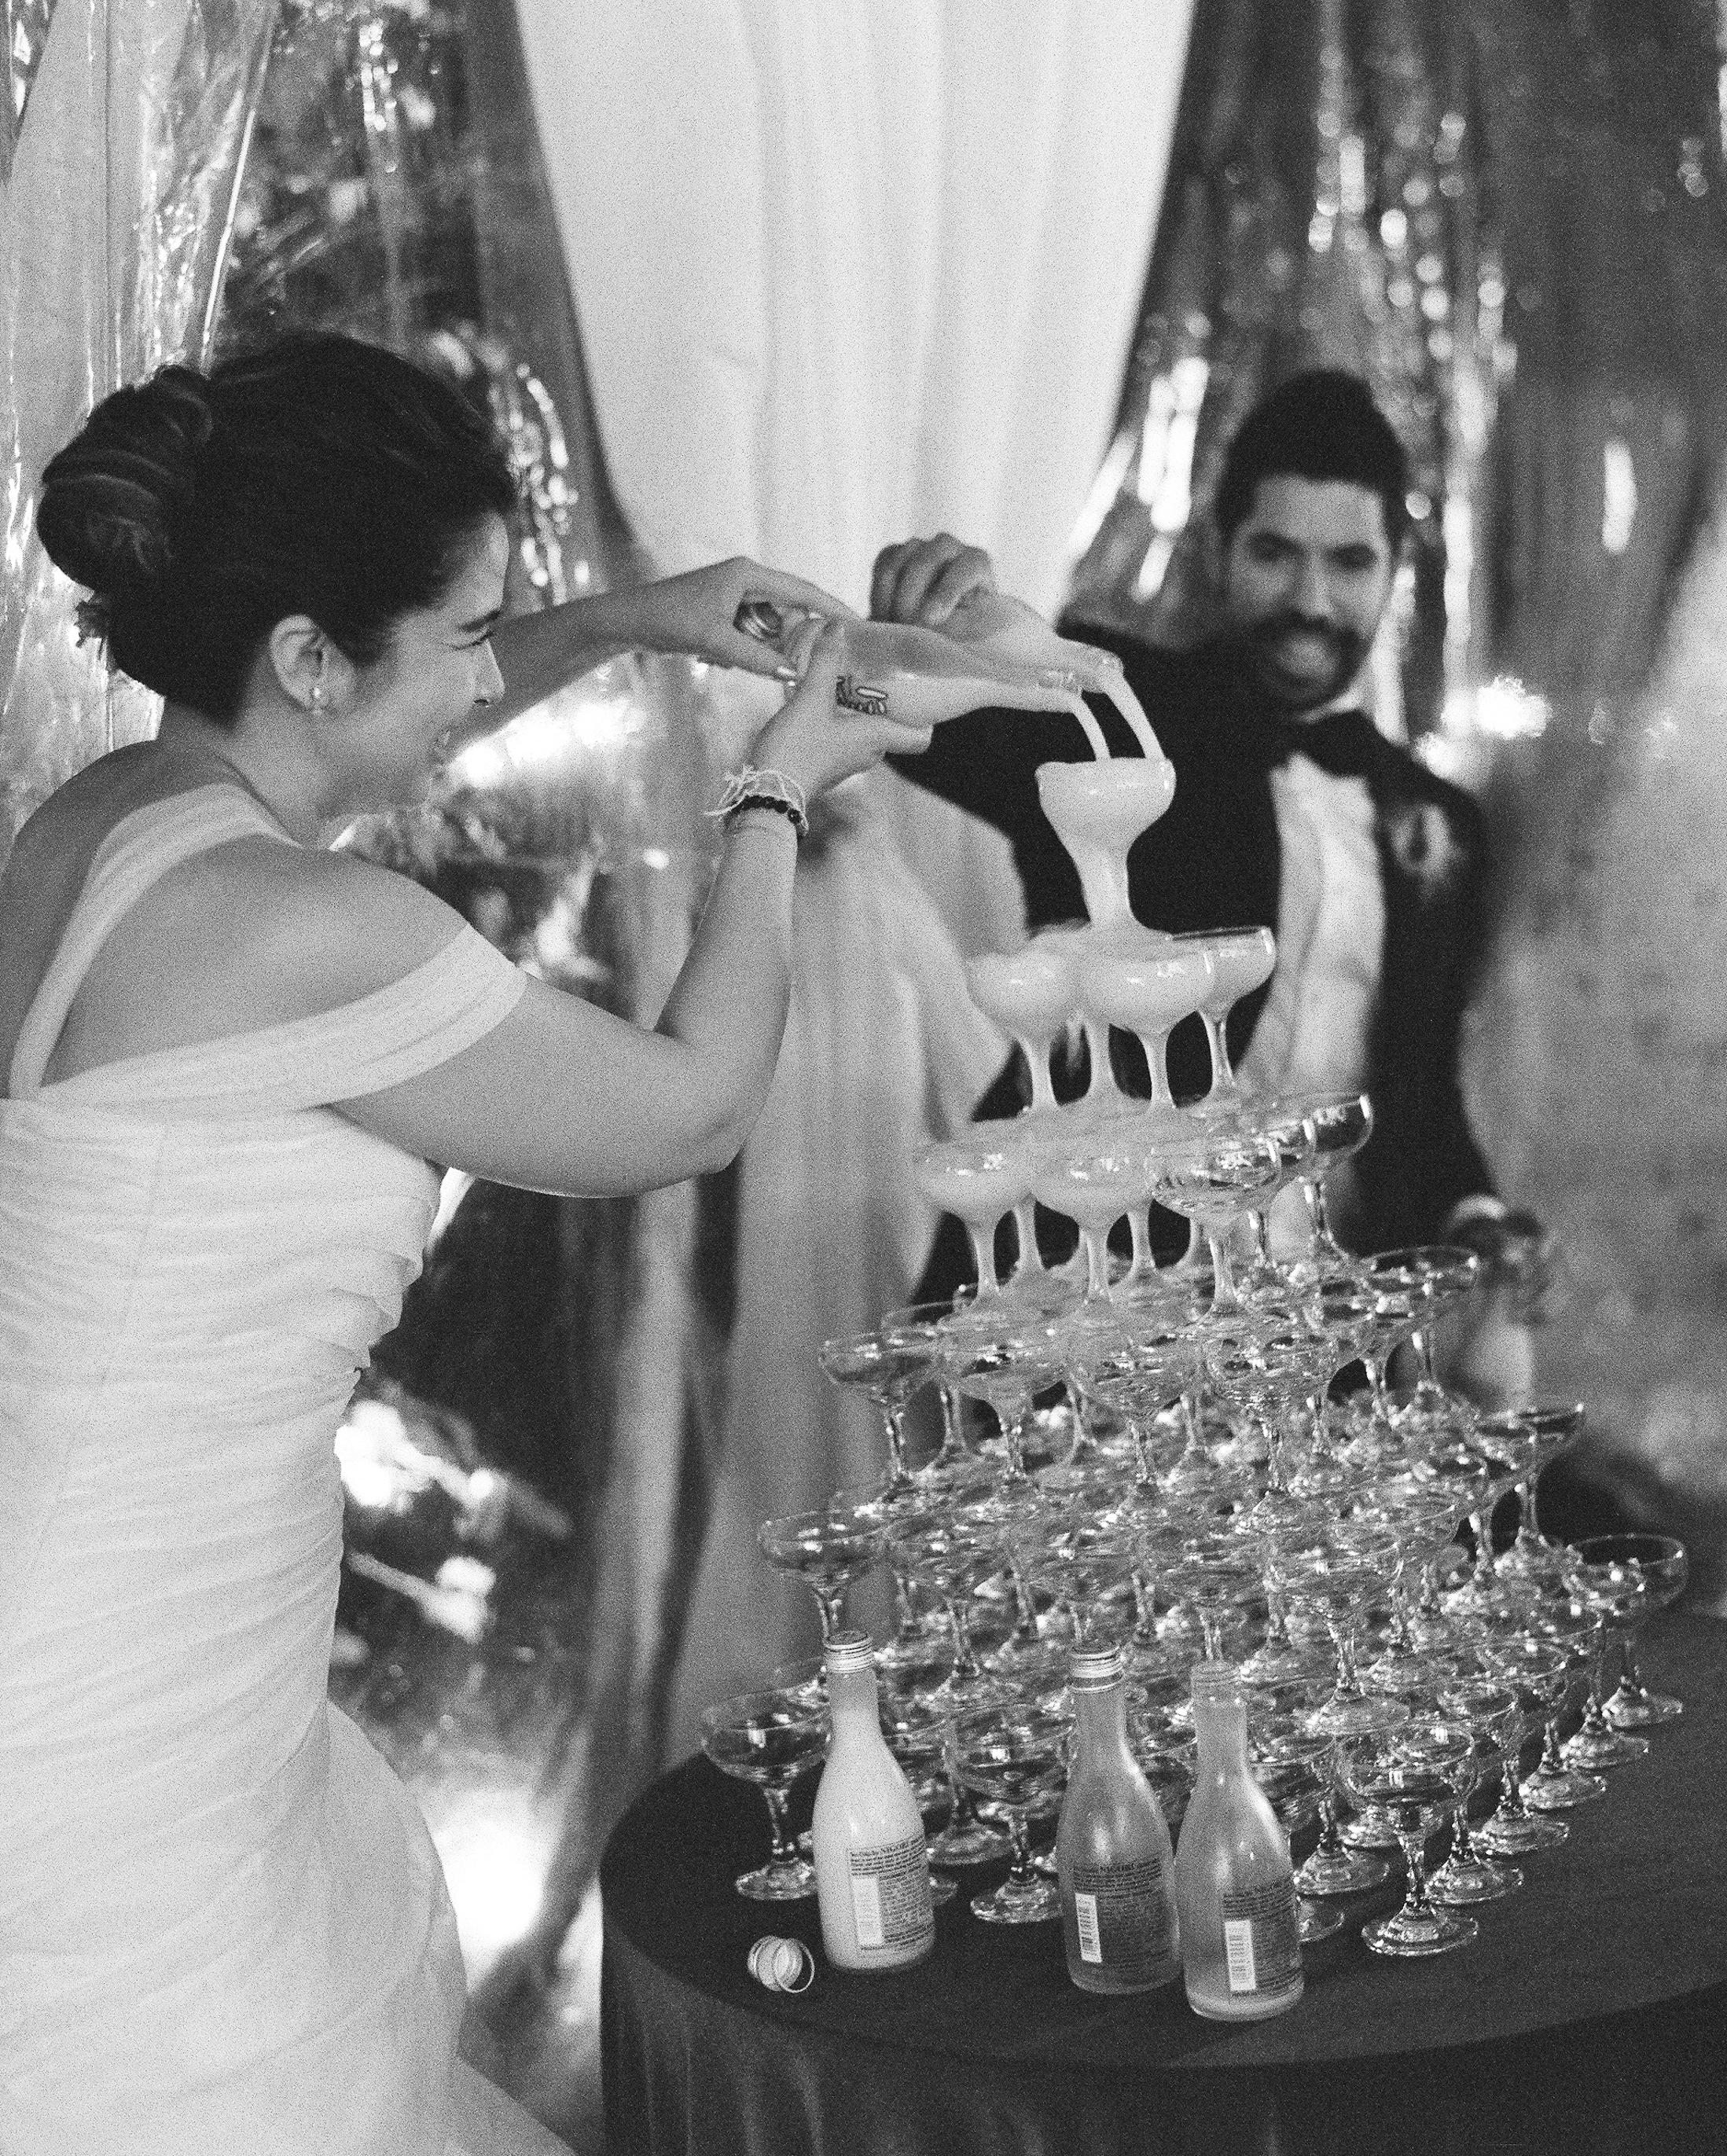 stacey-adam-wedding-tower-0106-s112112-0815.jpg